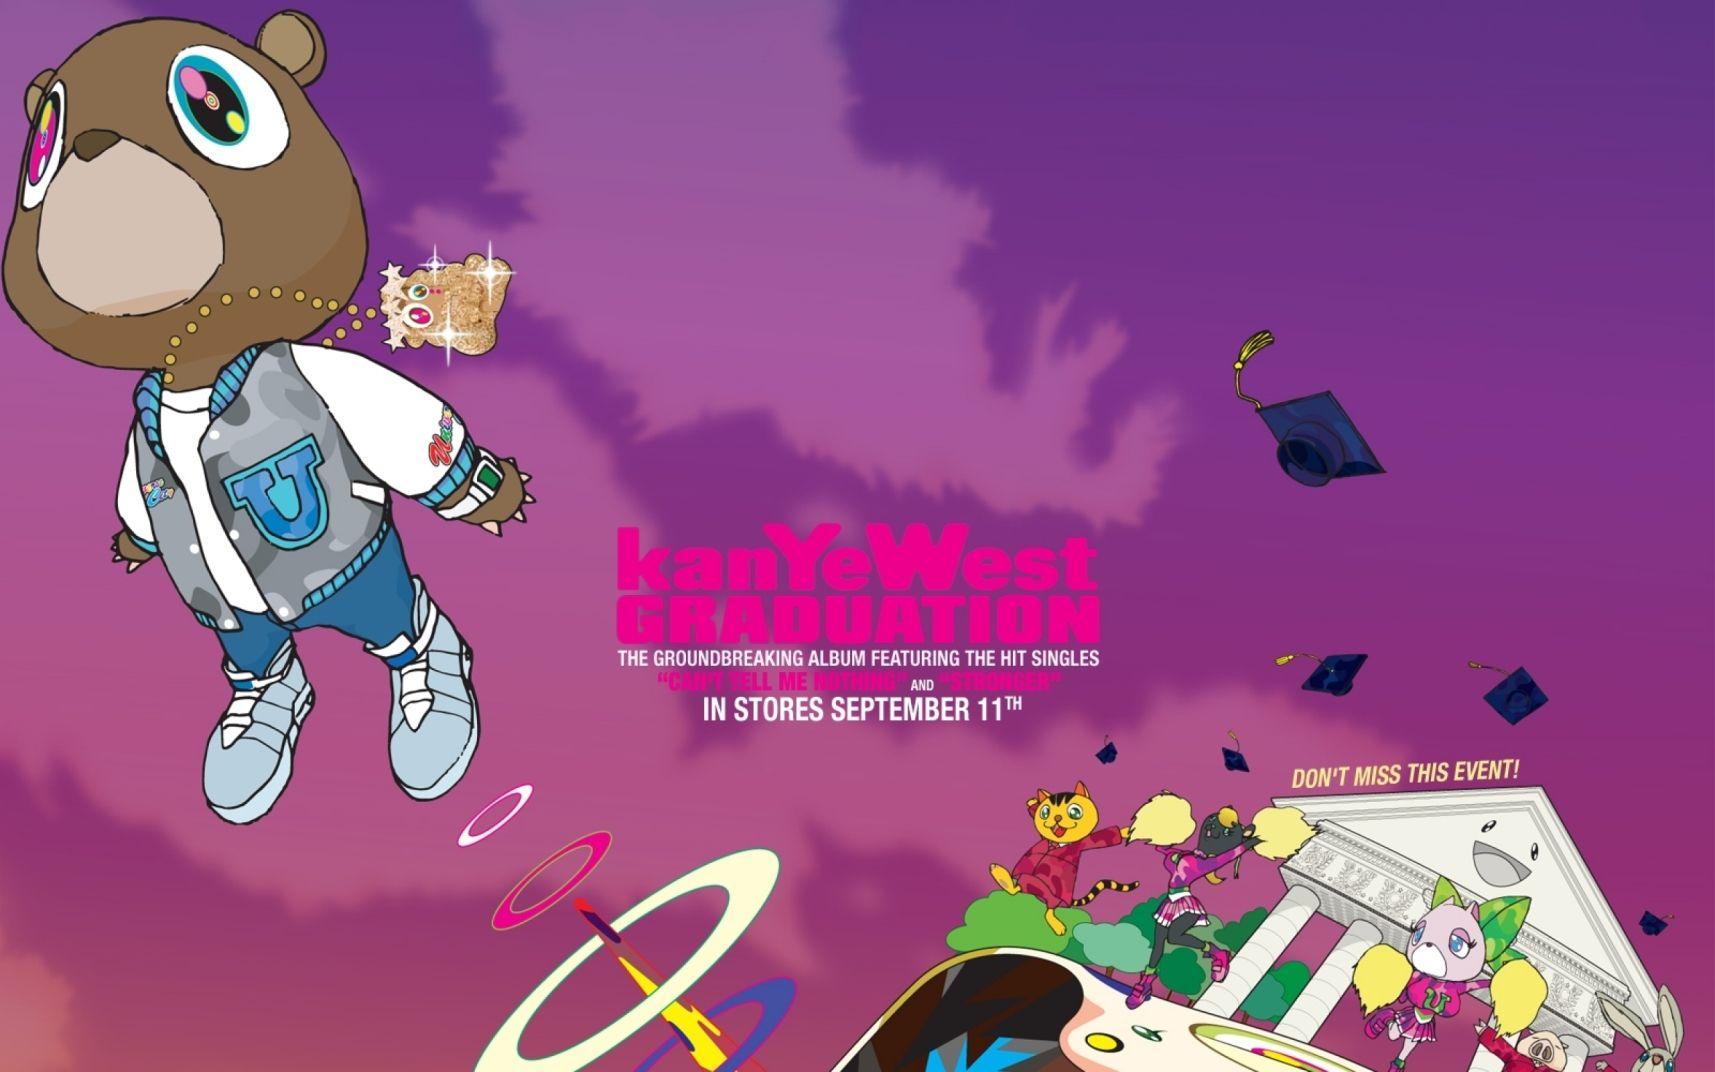 Kanye West Graduation Wallpaper  Kanye West  Pinterest. High School Graduation Statistics. Restaurants Menu Design Template. Fresh Flower Leis For Graduation. Personal Trainer Bios Template. Party Bus Flyer. Download Business Plan Template. Kent State Graduate Programs. Fascinating Psd Invoice Template